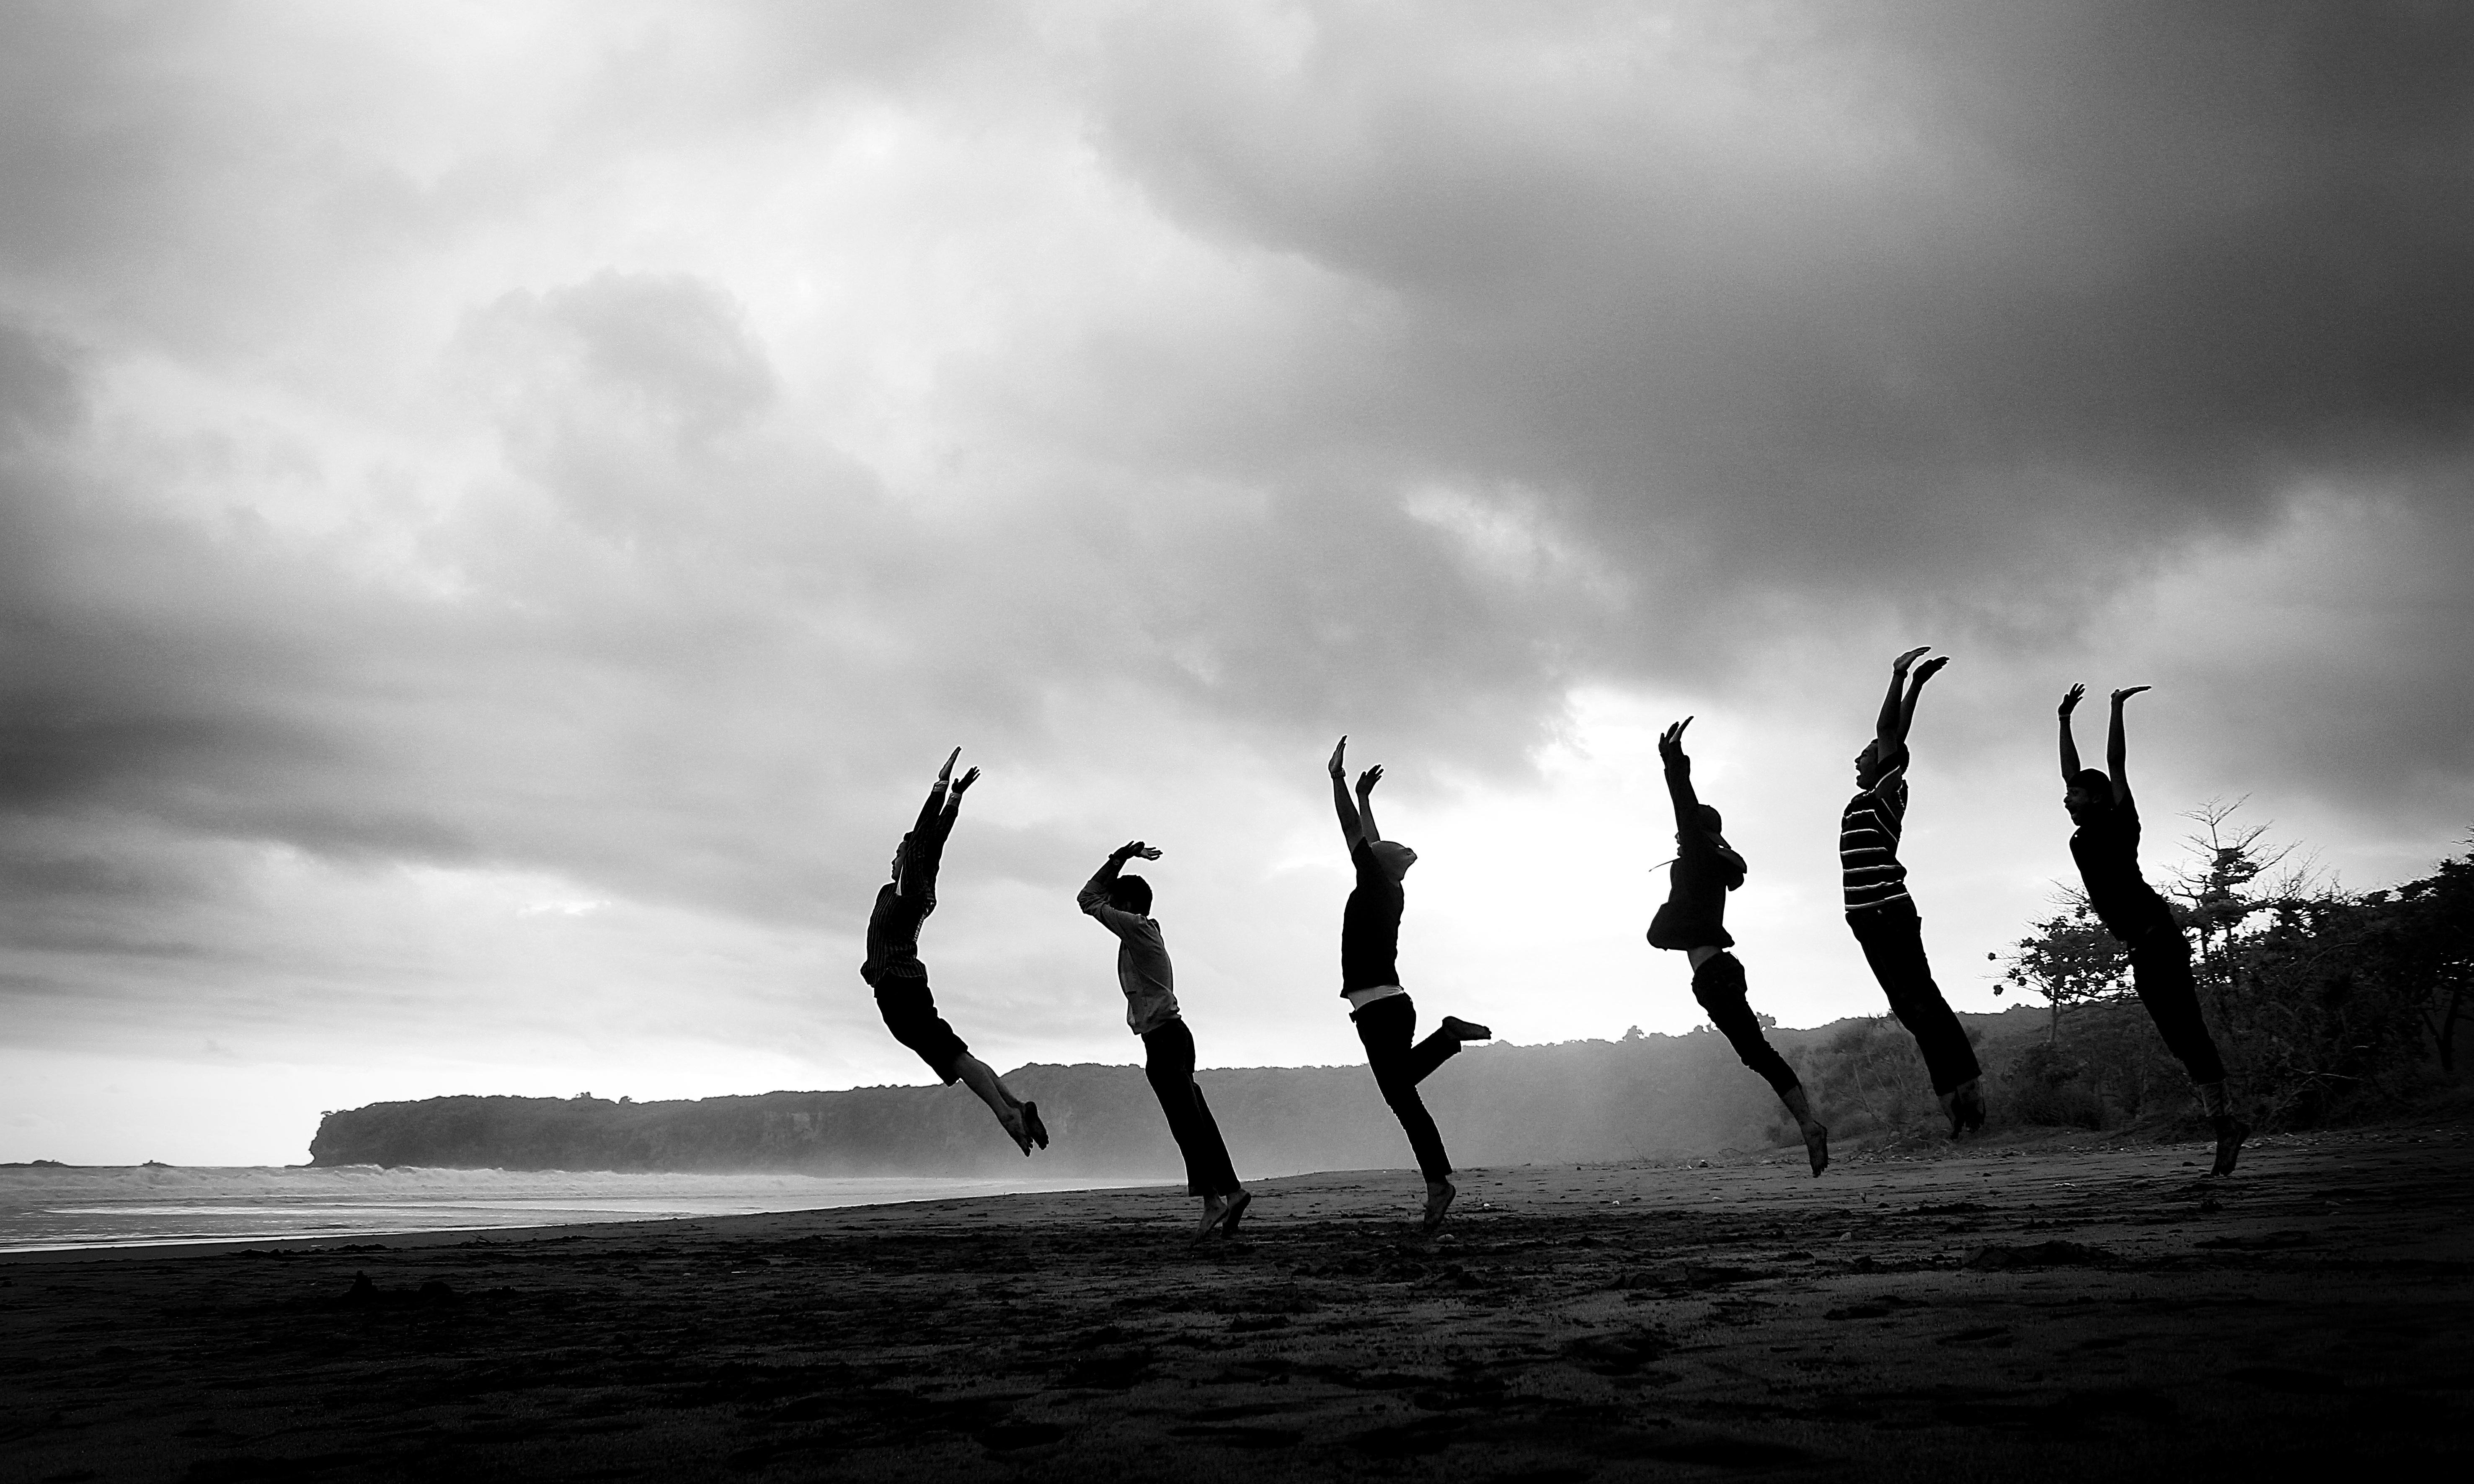 Kostenlose foto : Strand, Meer, Ozean, Horizont, Silhouette, Wolke ...